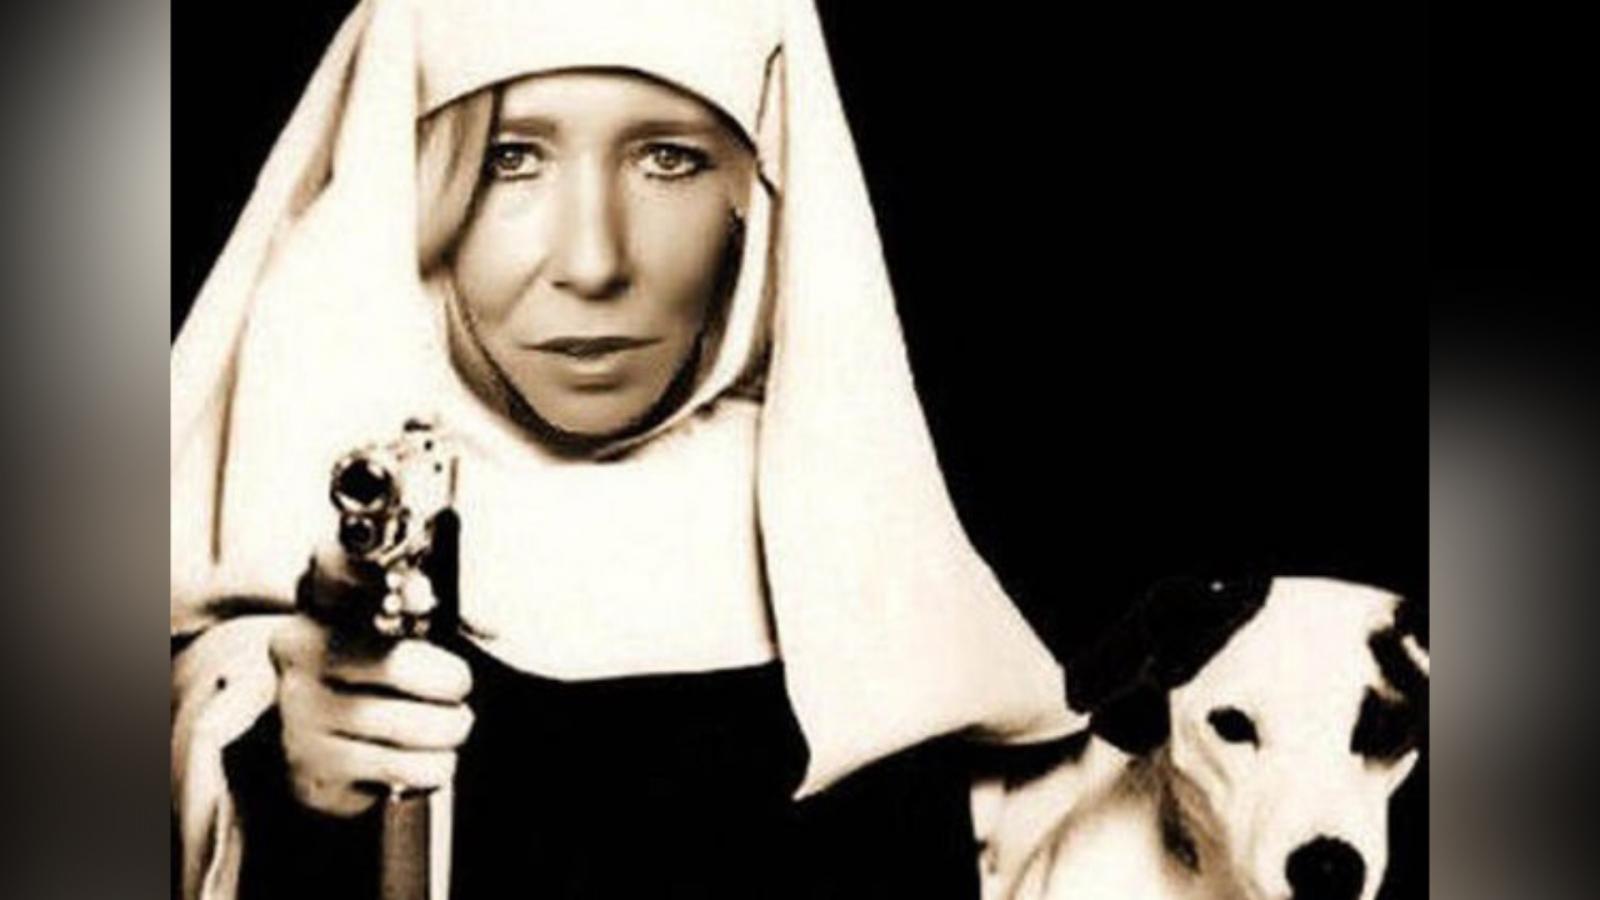 british-isis-recruiter-white-widow-a-k-a-sally-jones-killed-in-syrian-drone-strike